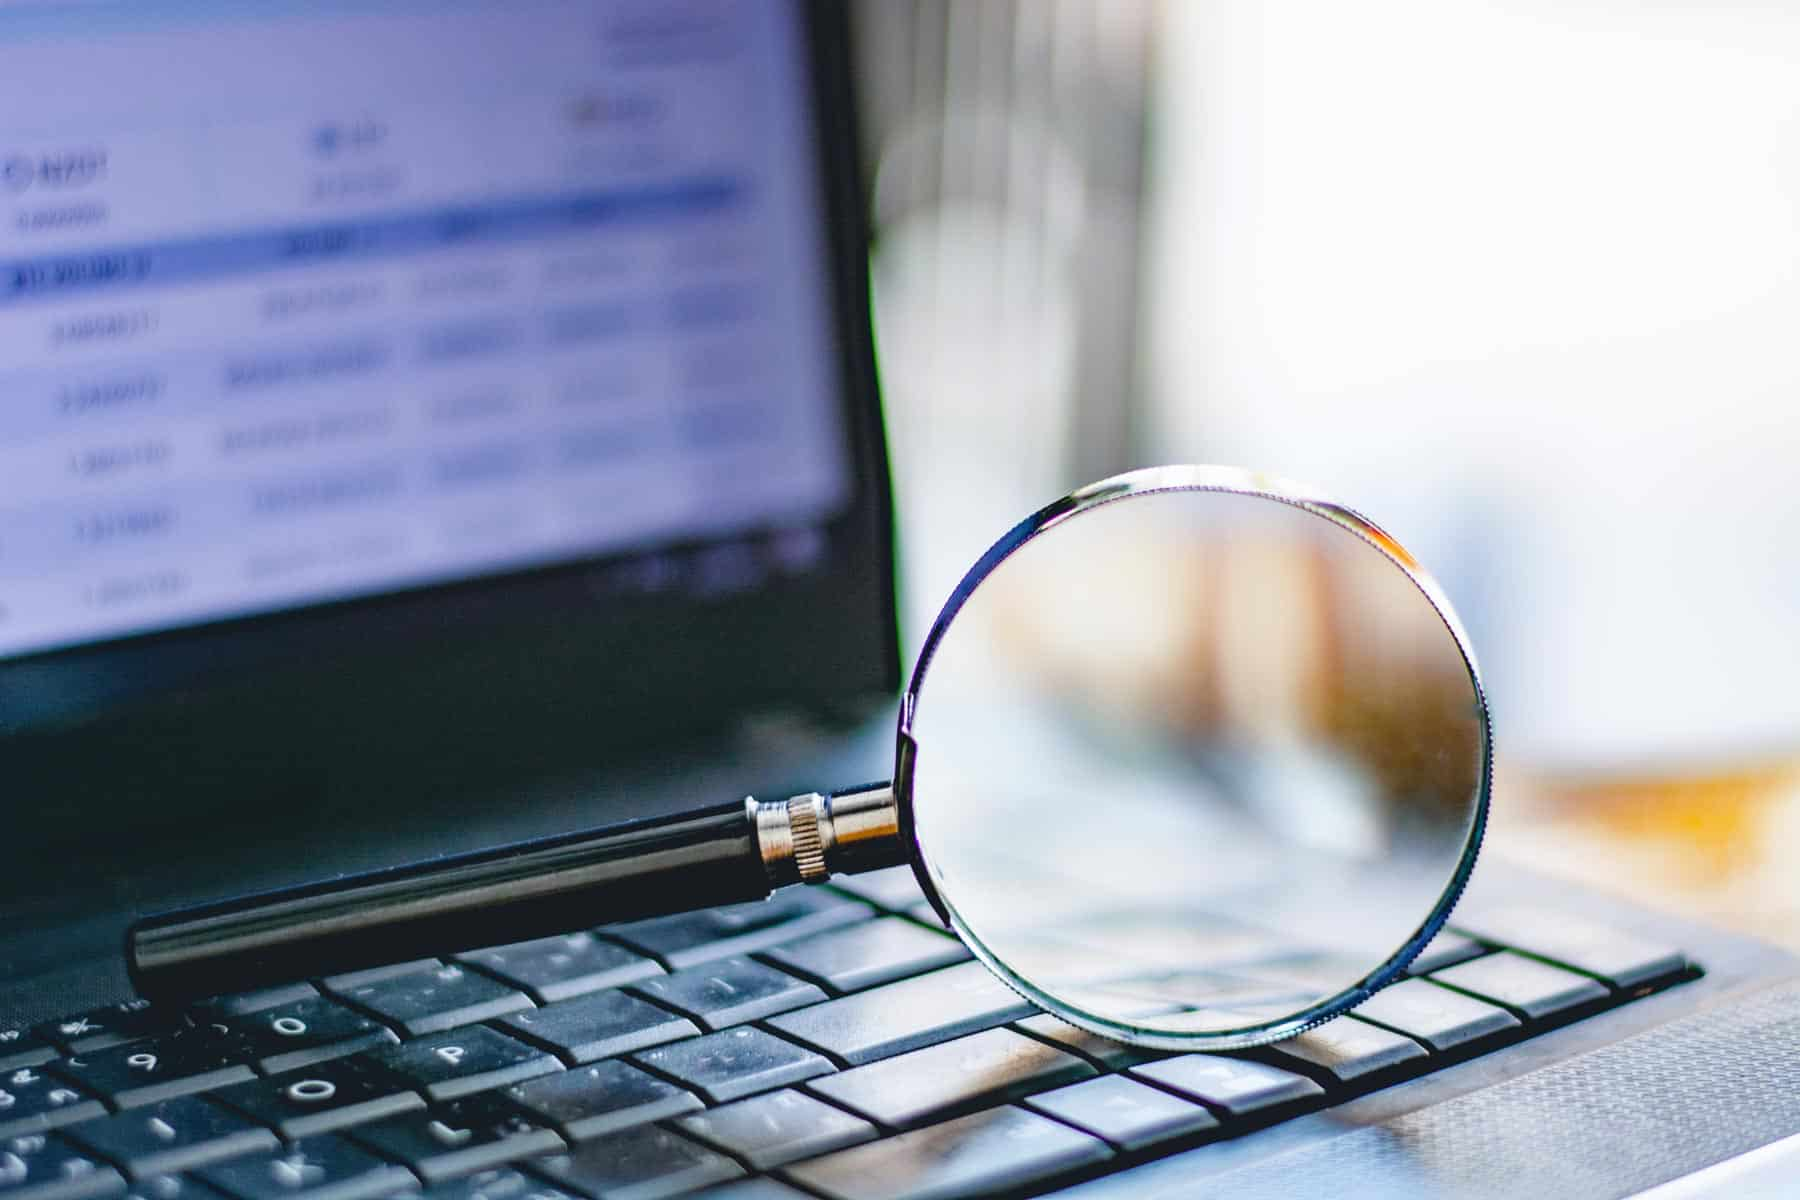 DOT employee background checks ramp up with seasonal hires